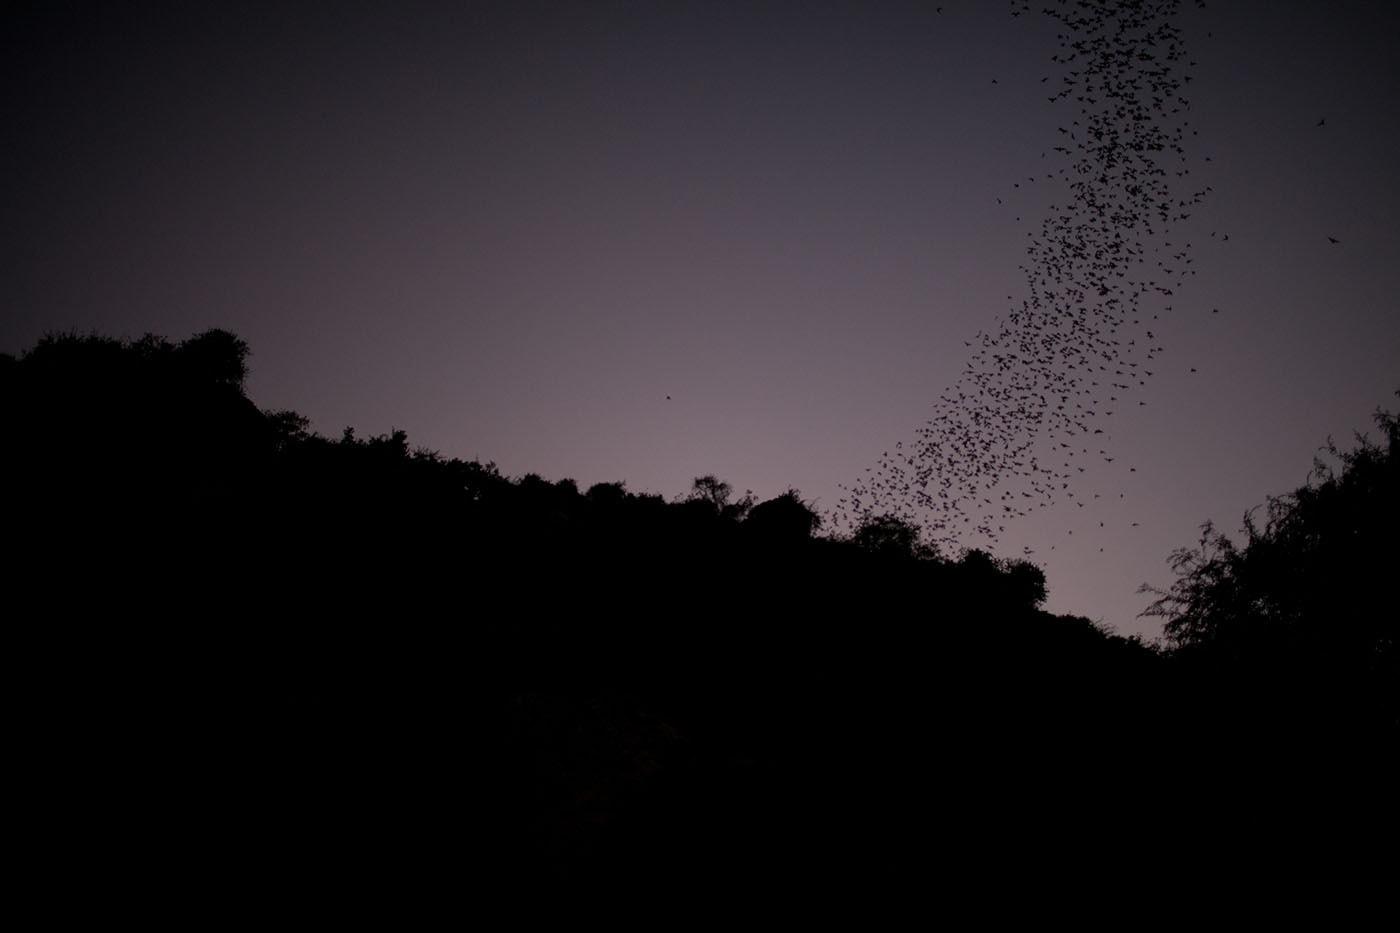 Bats flying from the killing caves in Battambang, Cambodia